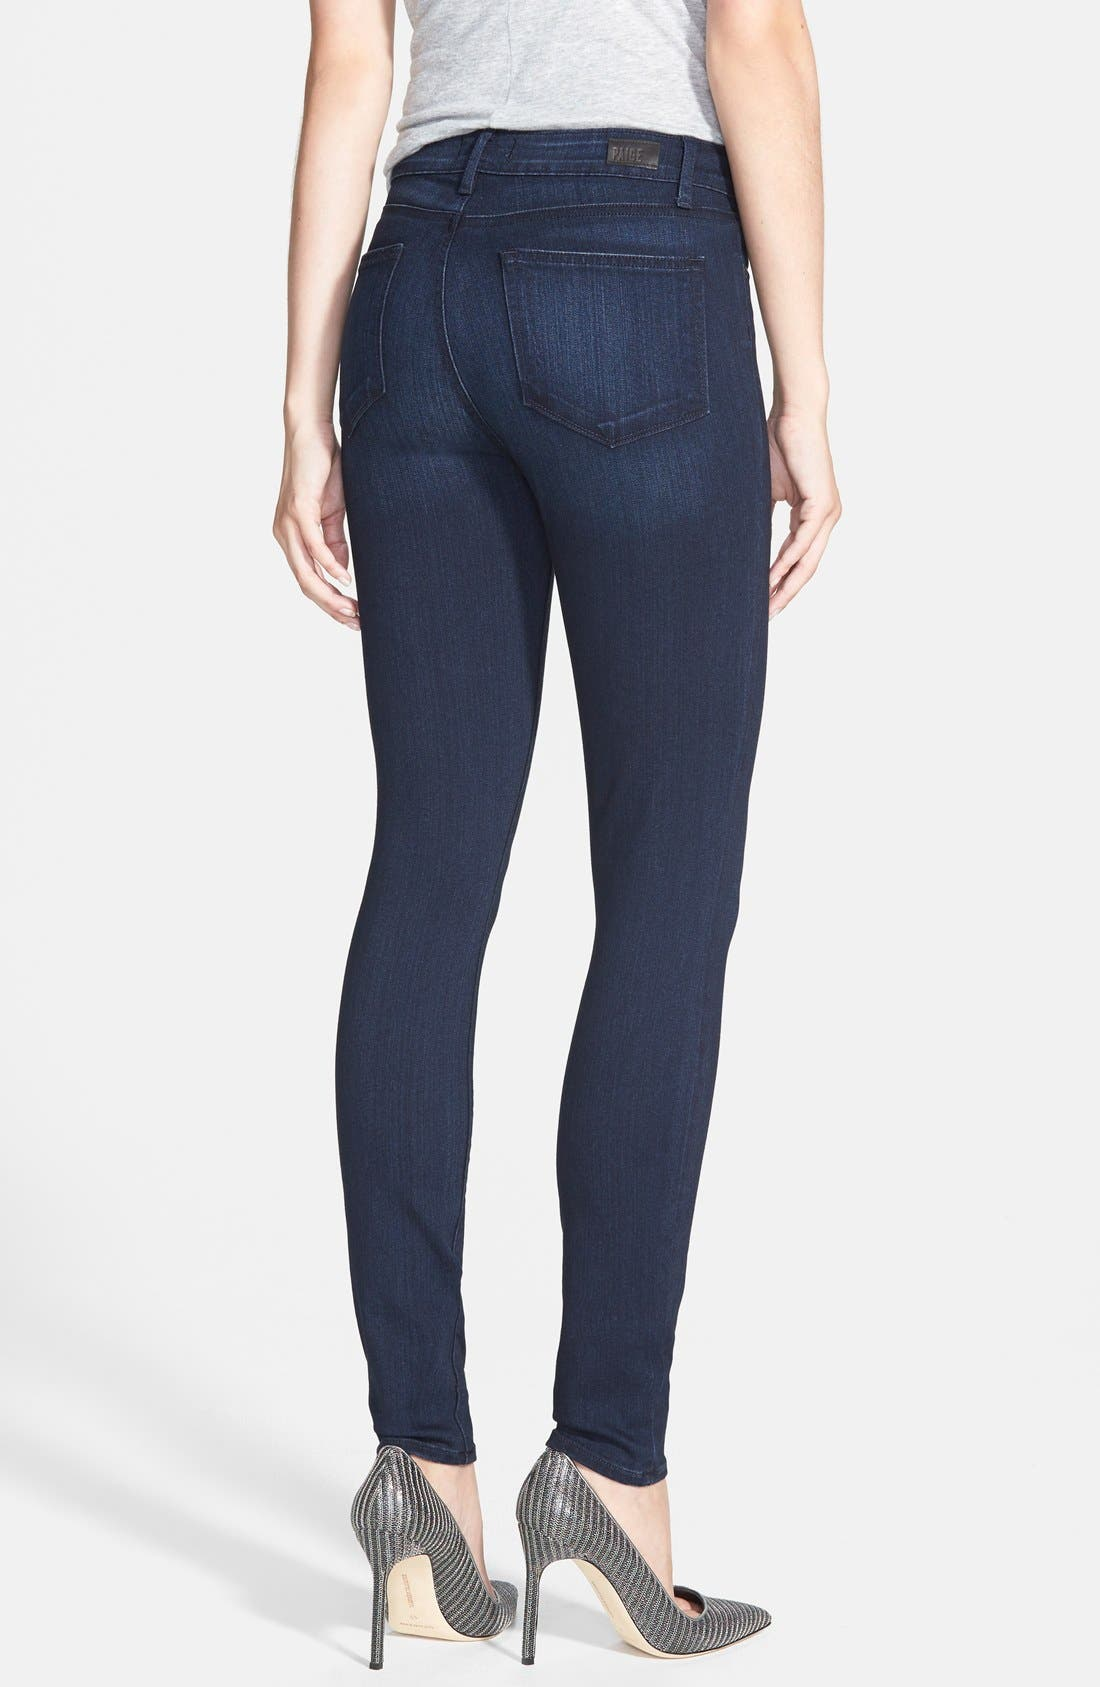 Denim 'Transcend - Hoxton' High Rise Ultra Skinny Jeans,                             Alternate thumbnail 6, color,                             400